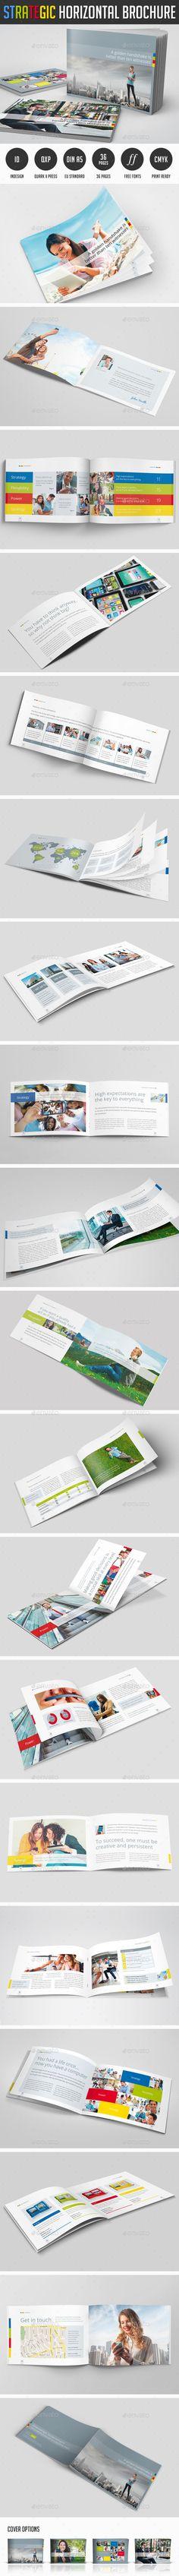 Bifold Brochure Bundle Volume Brochures Brochure Template - Horizontal brochure template